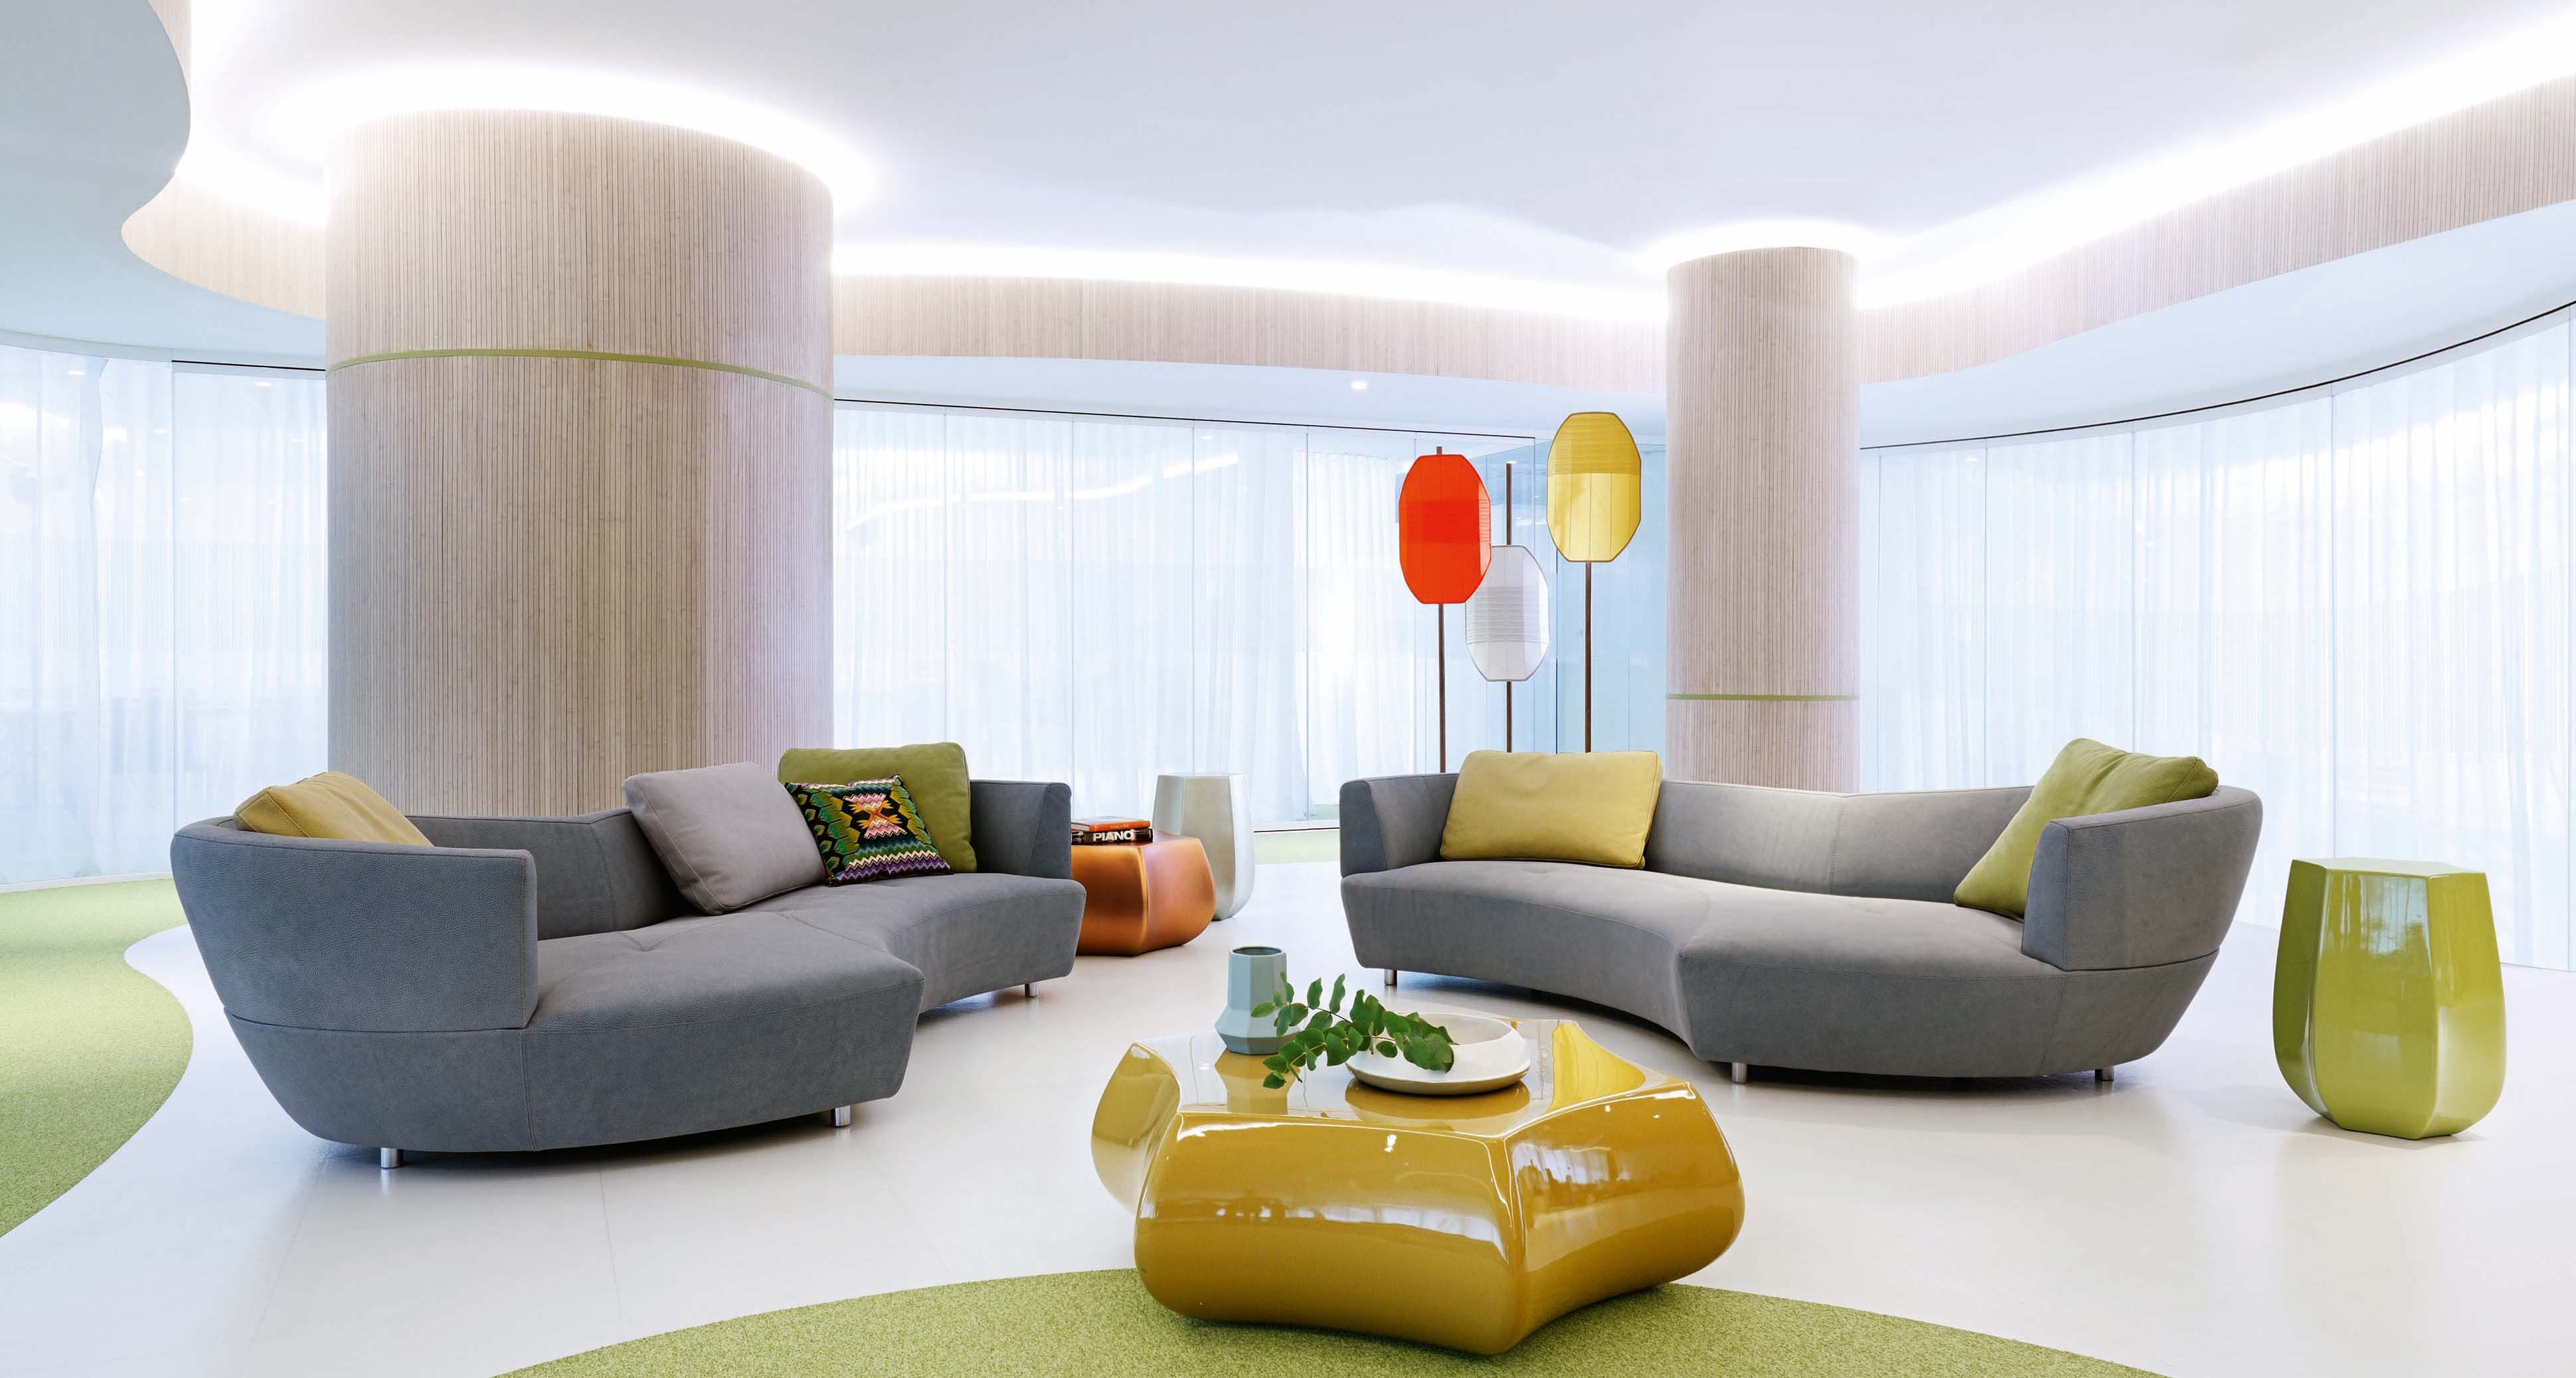 Roche Bobois Digital Sofa Designed By Gabriele Assmann Alfred Kleene Manufacture In Europe Rochebobois Canape Arrondi Canape Design Mobilier De Salon